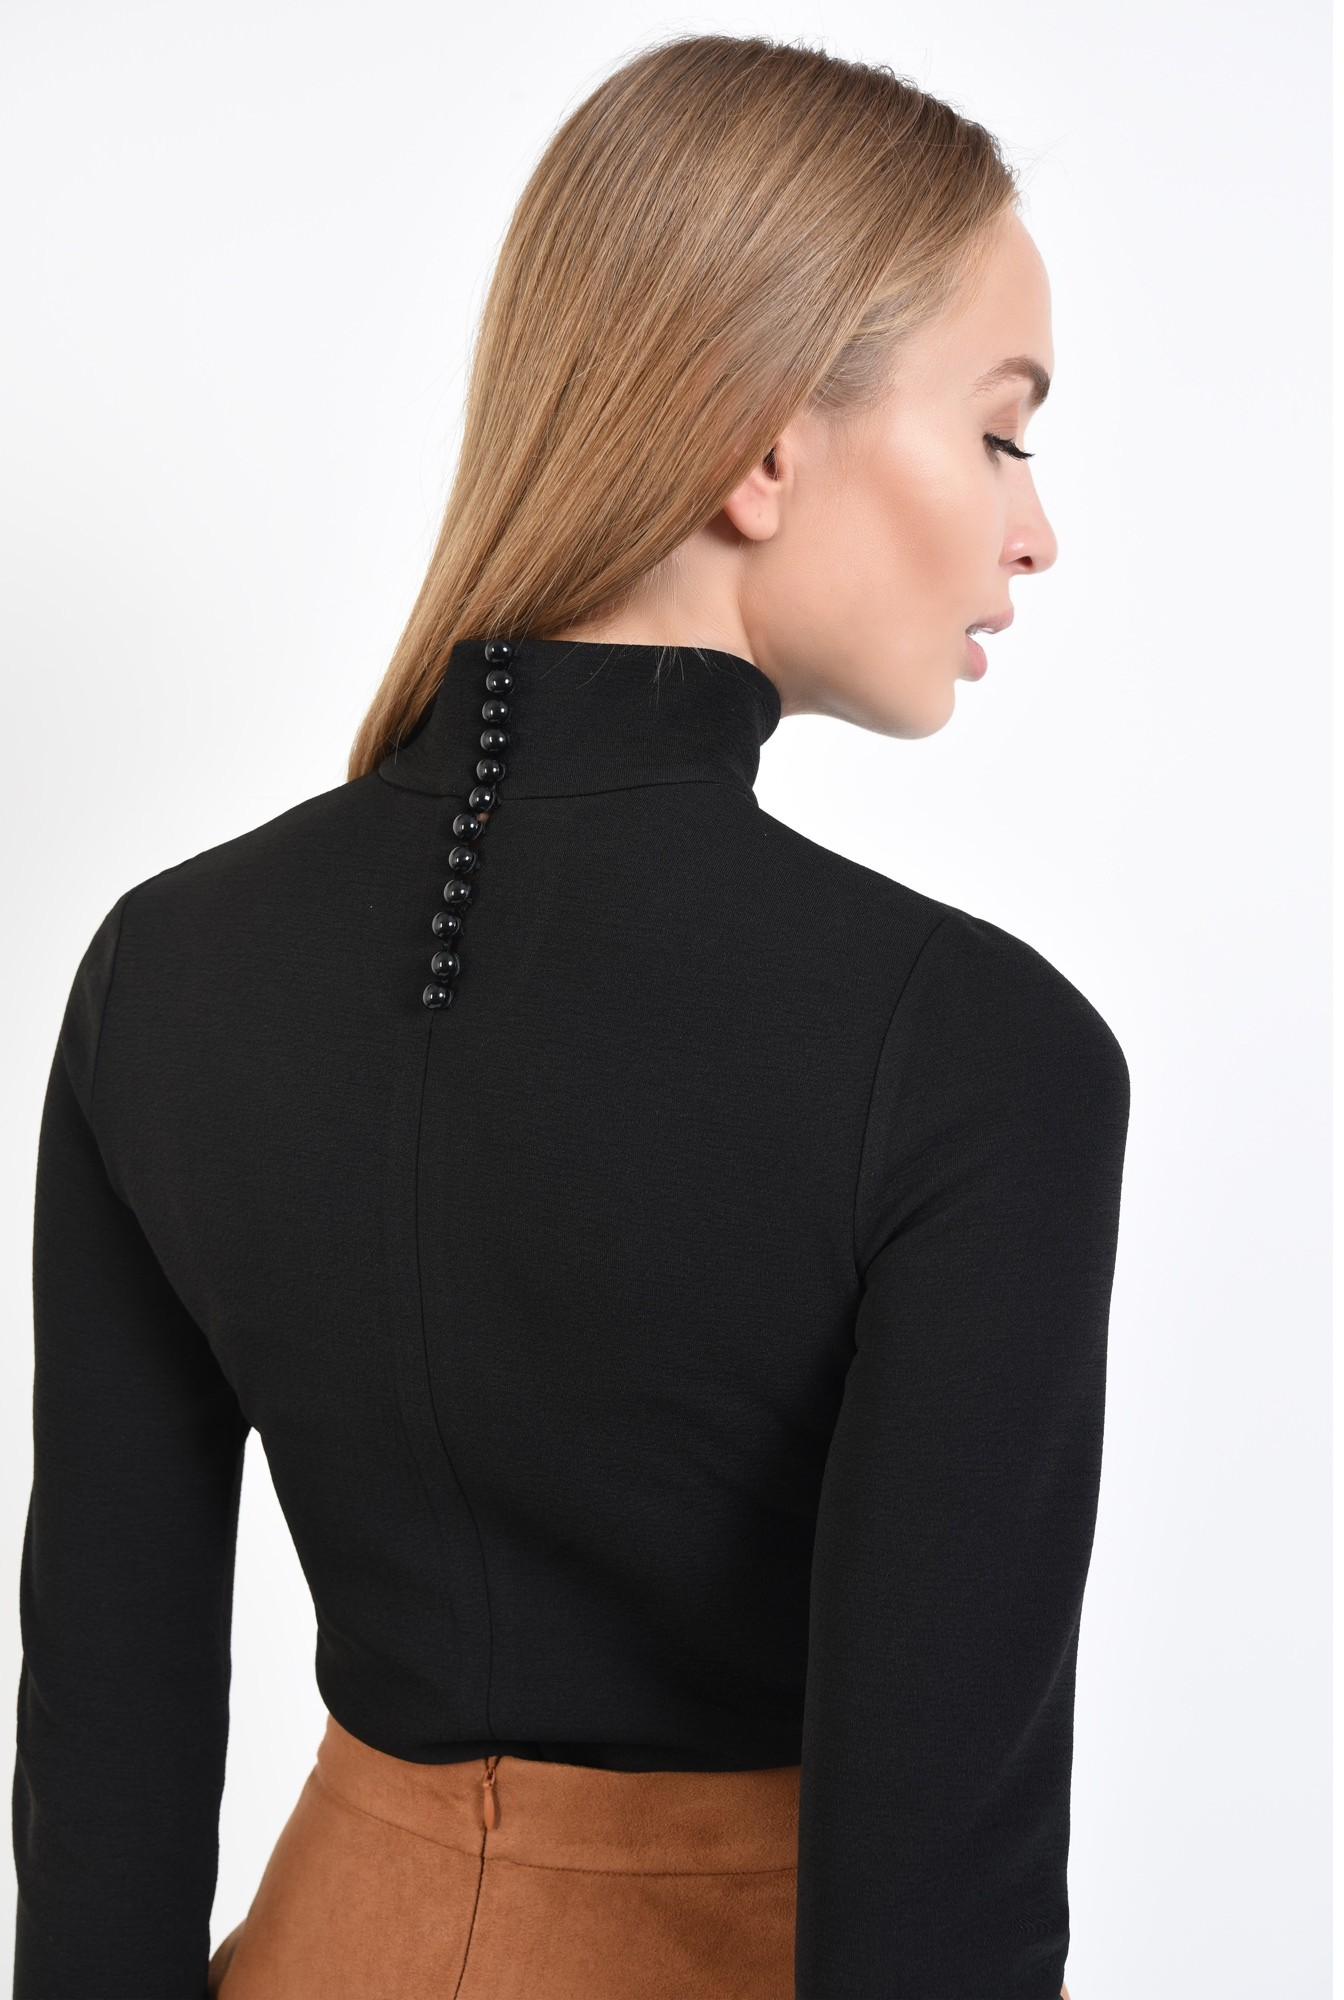 1 - bluza casual, neagra, mulata, helanca, nasturi decorativi